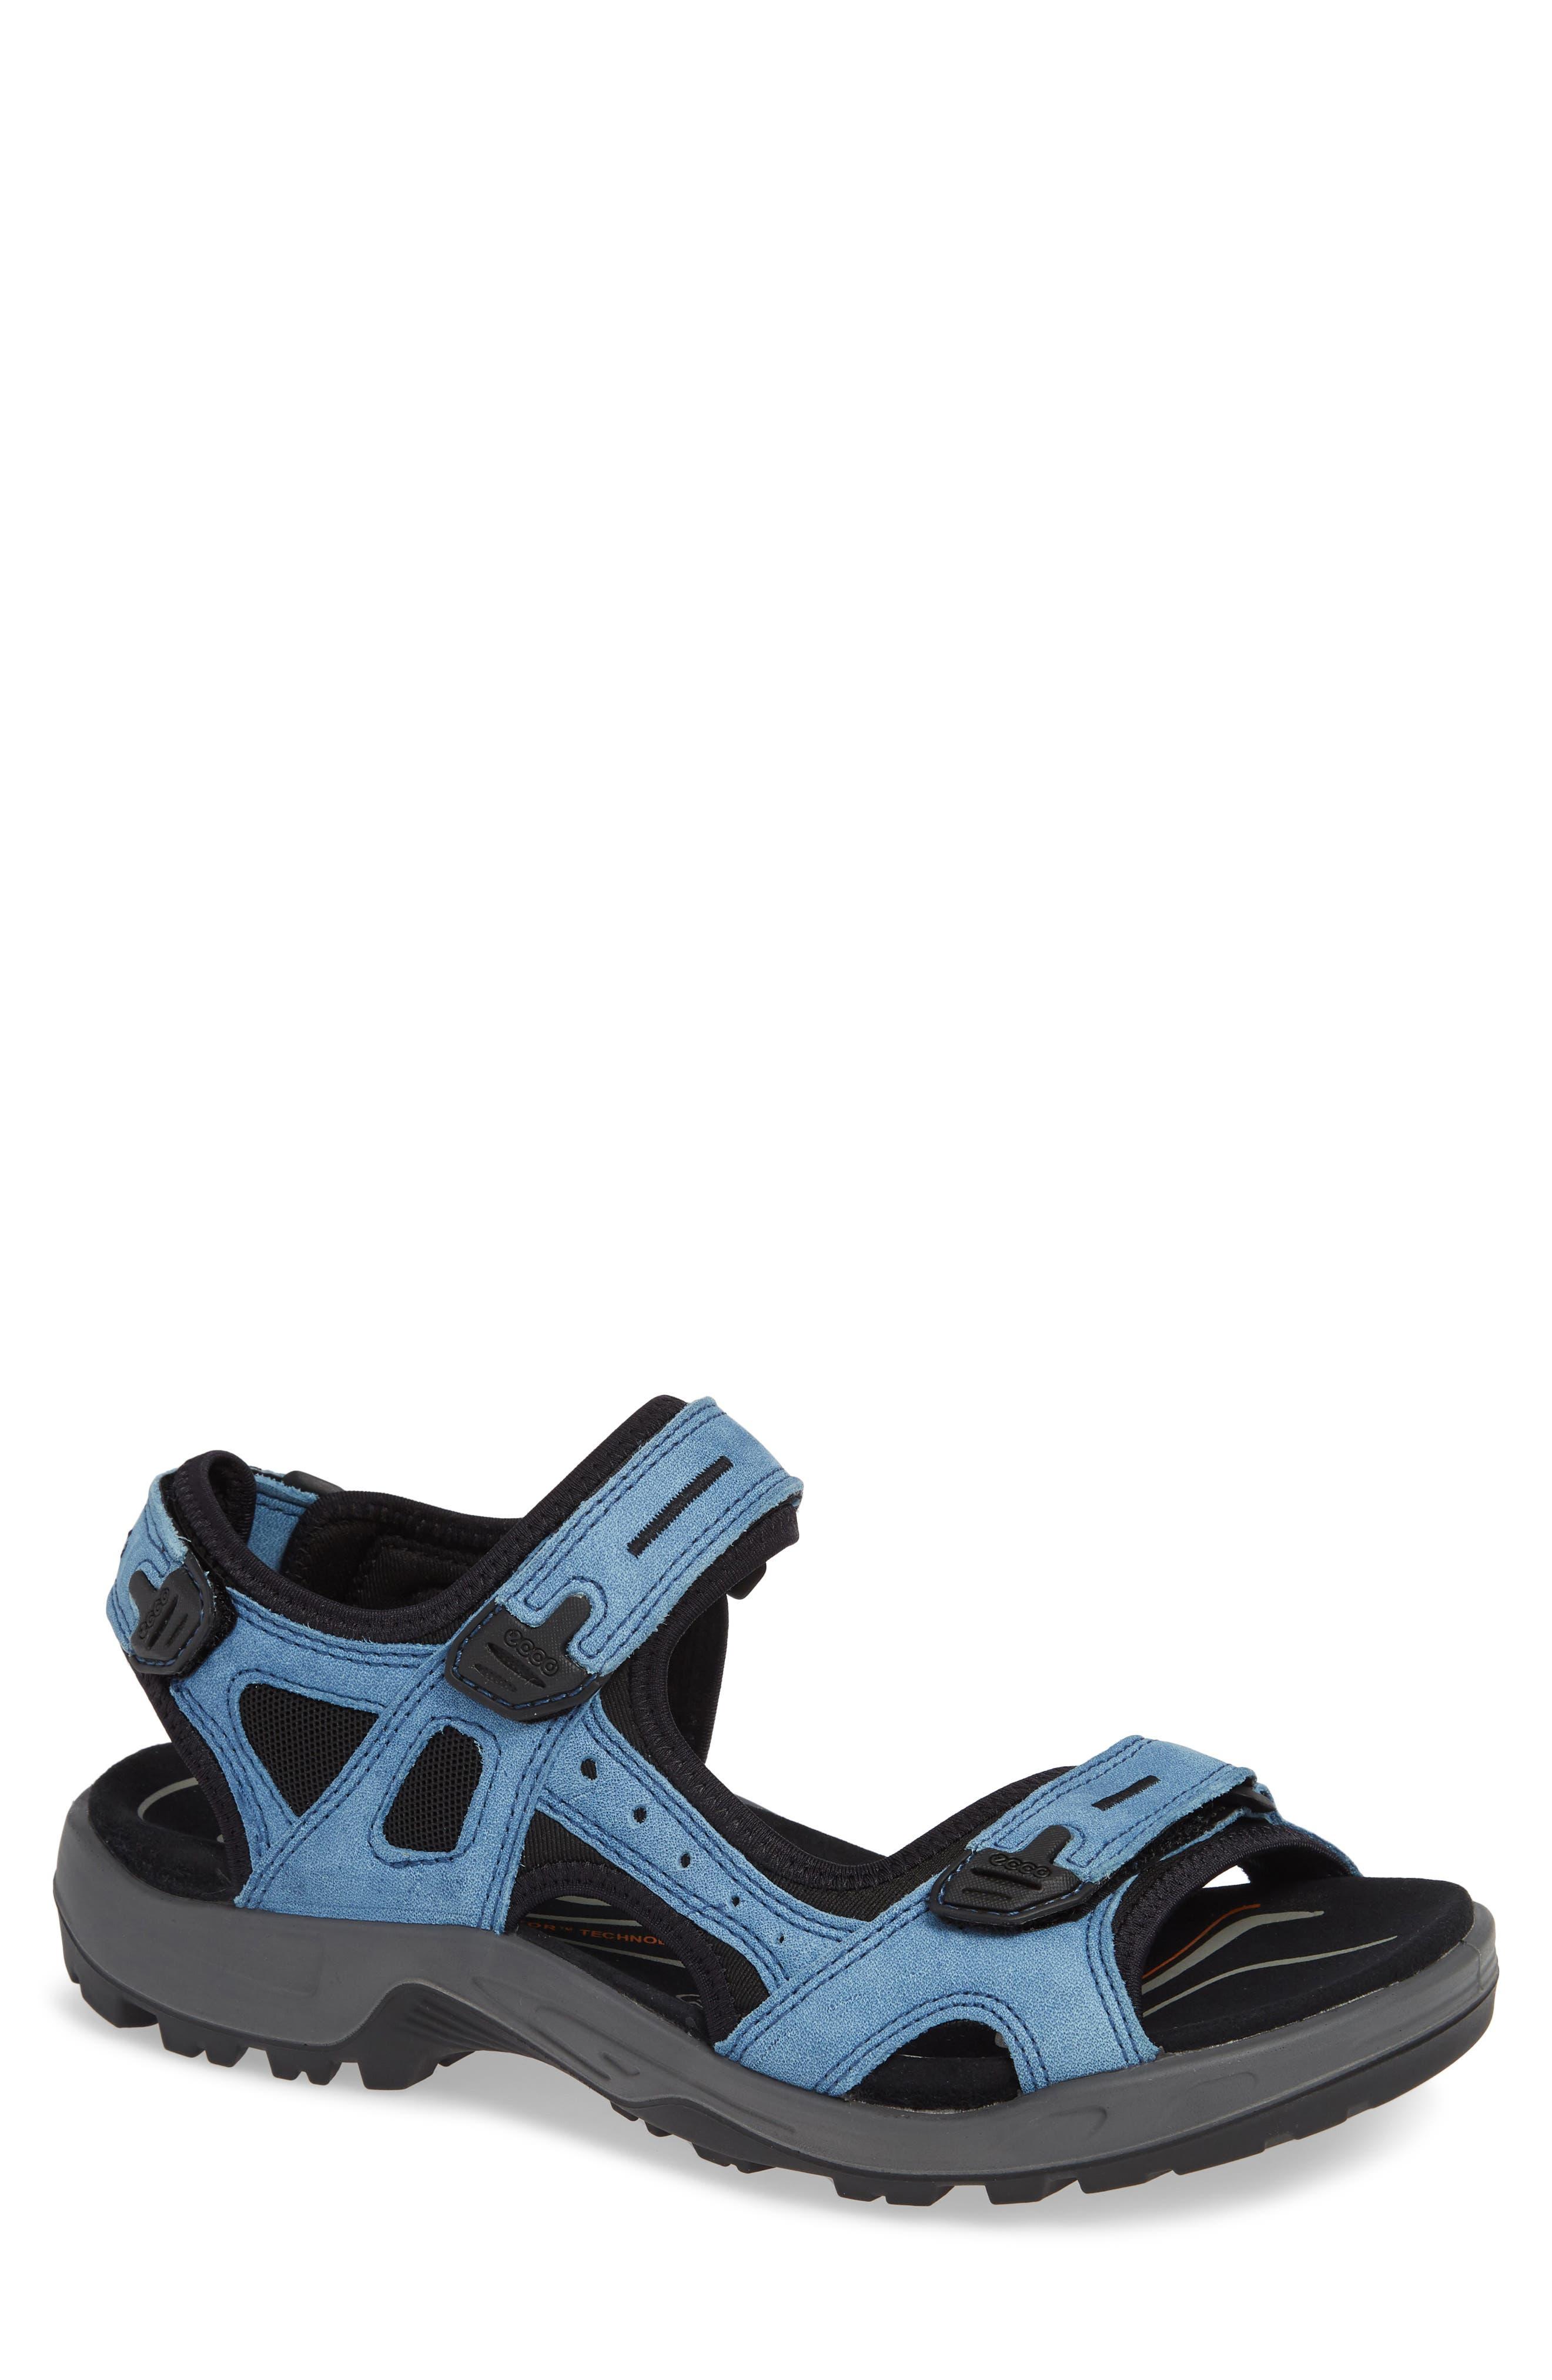 Offroad Sport Sandal,                         Main,                         color, INDIGO LEATHER